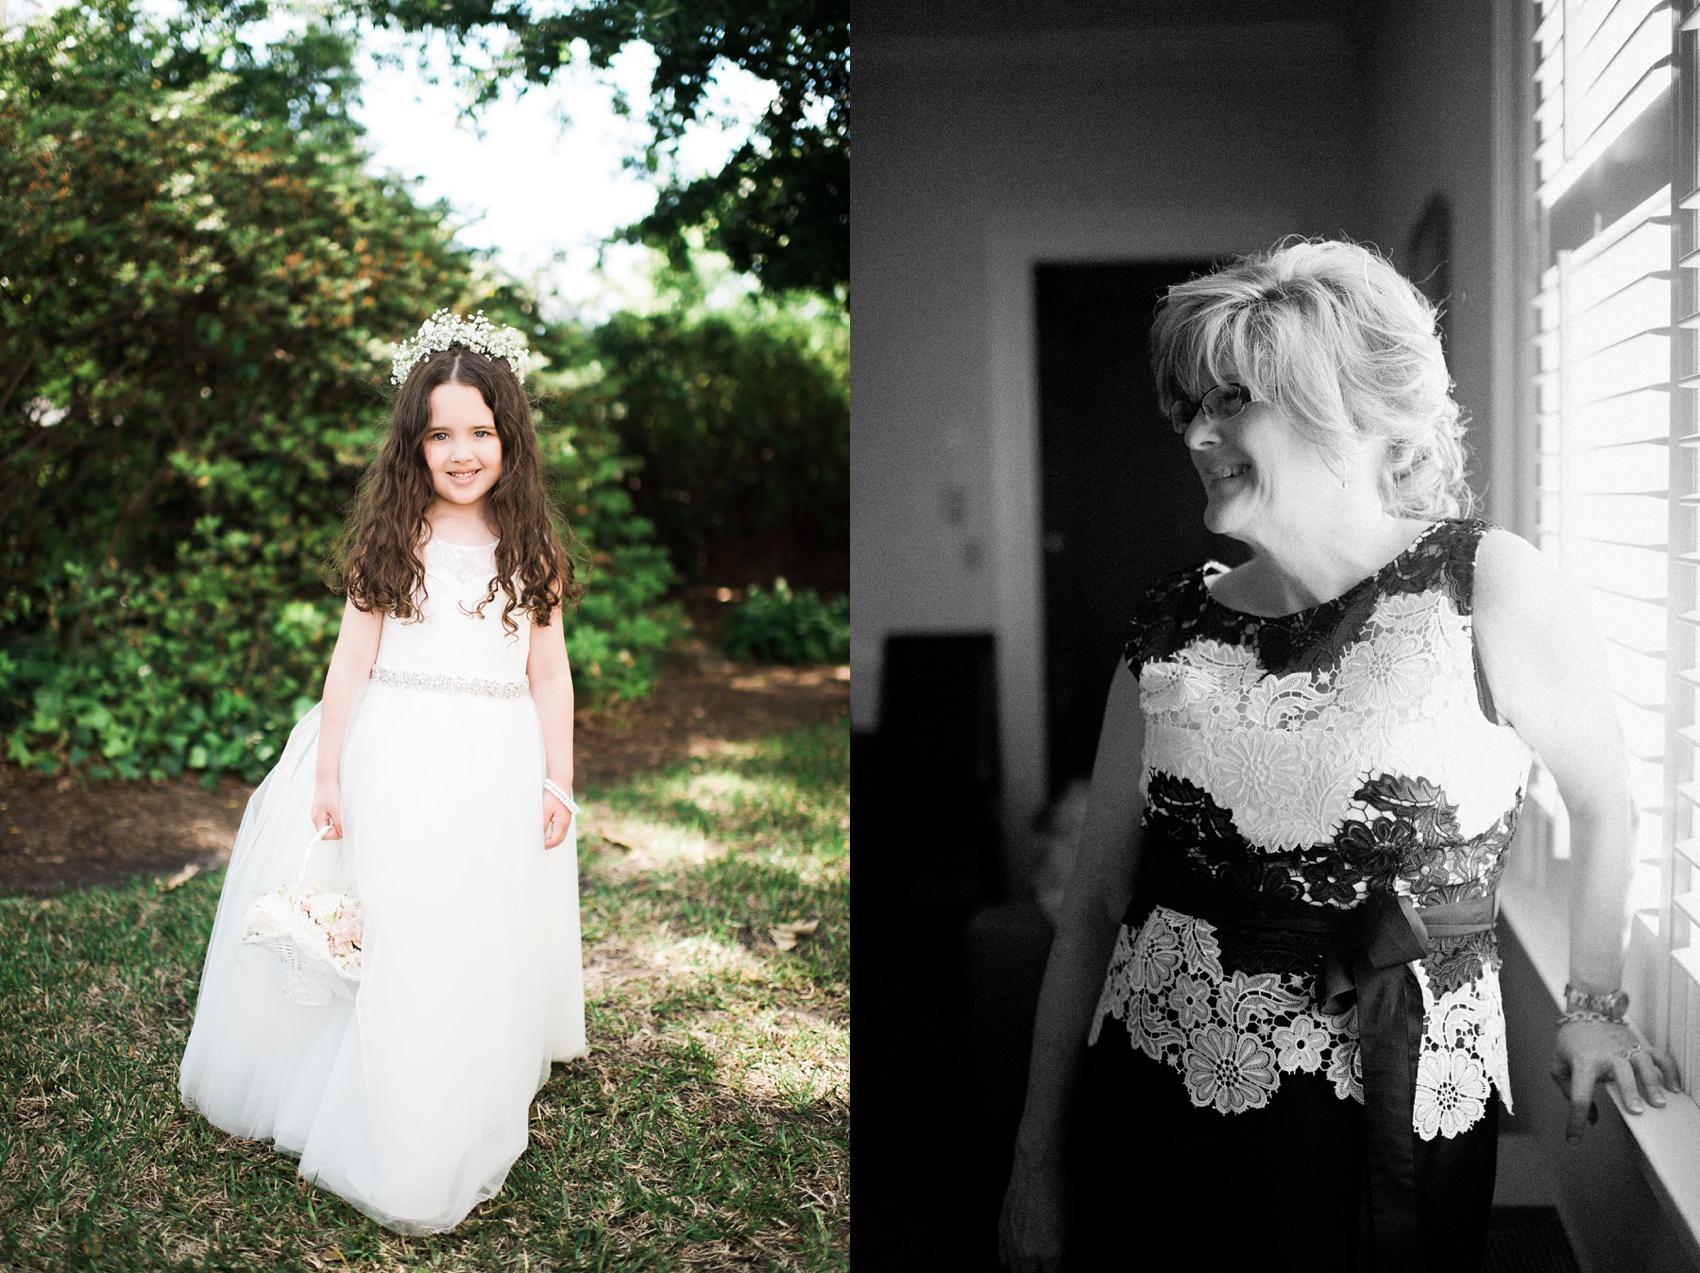 augusta_wedding_photographer_0026.jpg